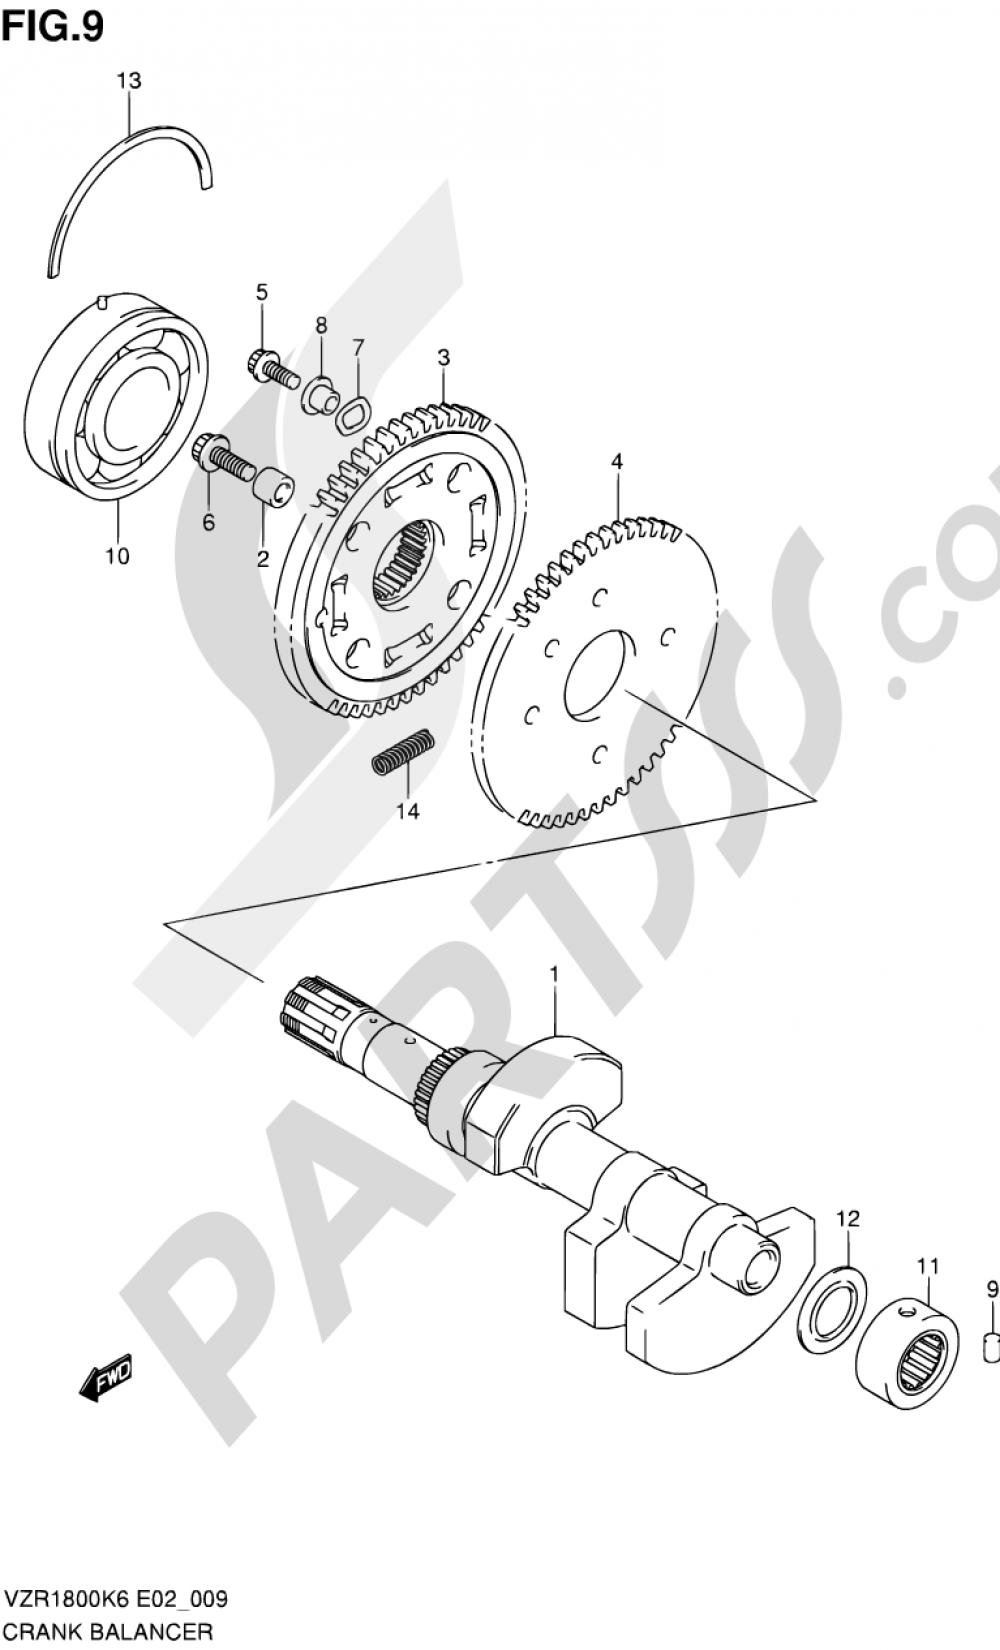 9 - CRANK BALANCER (MODEL K6/K7/K8/K9) Suzuki VZR1800N 2009